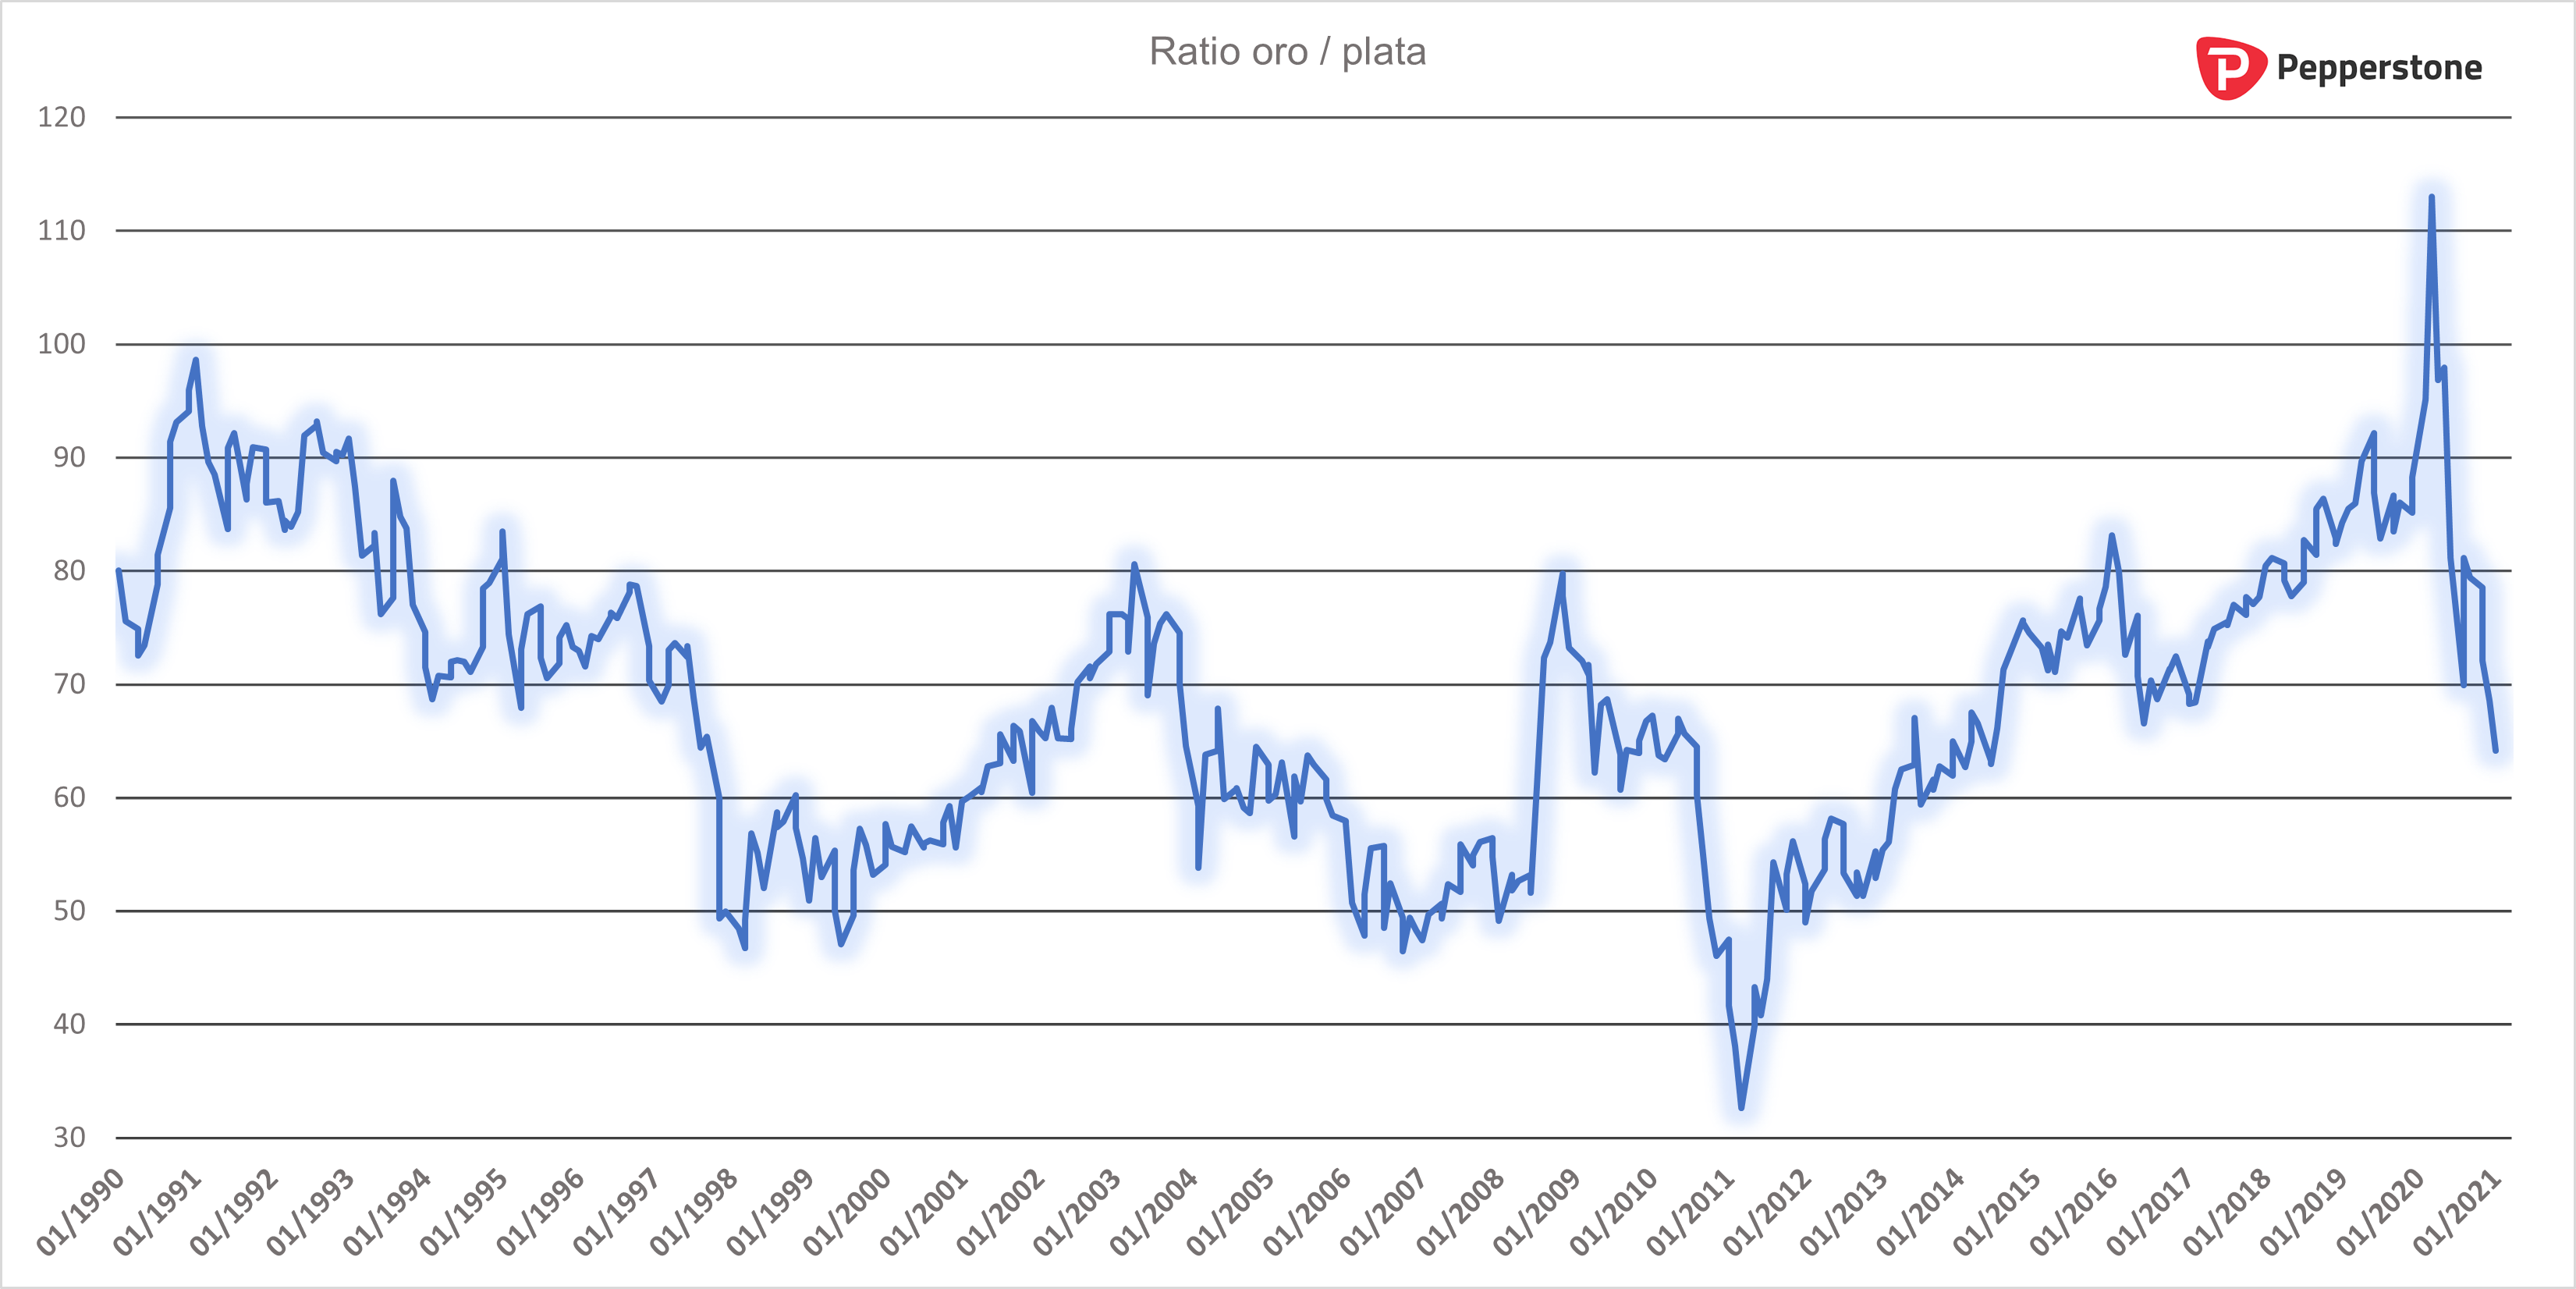 Ratio_oro_plata_mensual.png